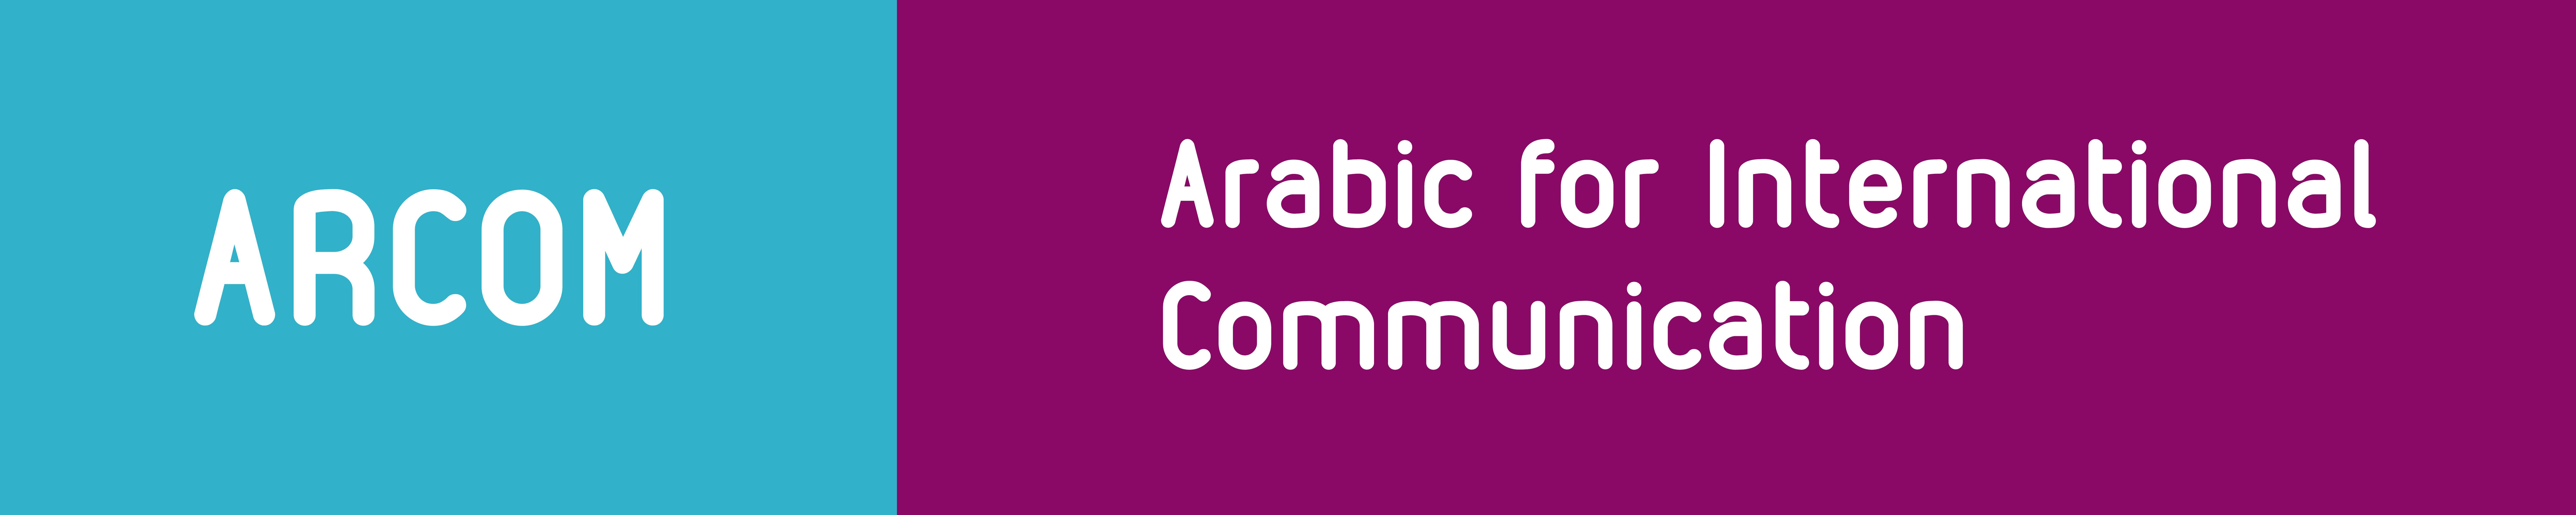 Bachelor of Arts (Hons.) in Arabic for International Communication